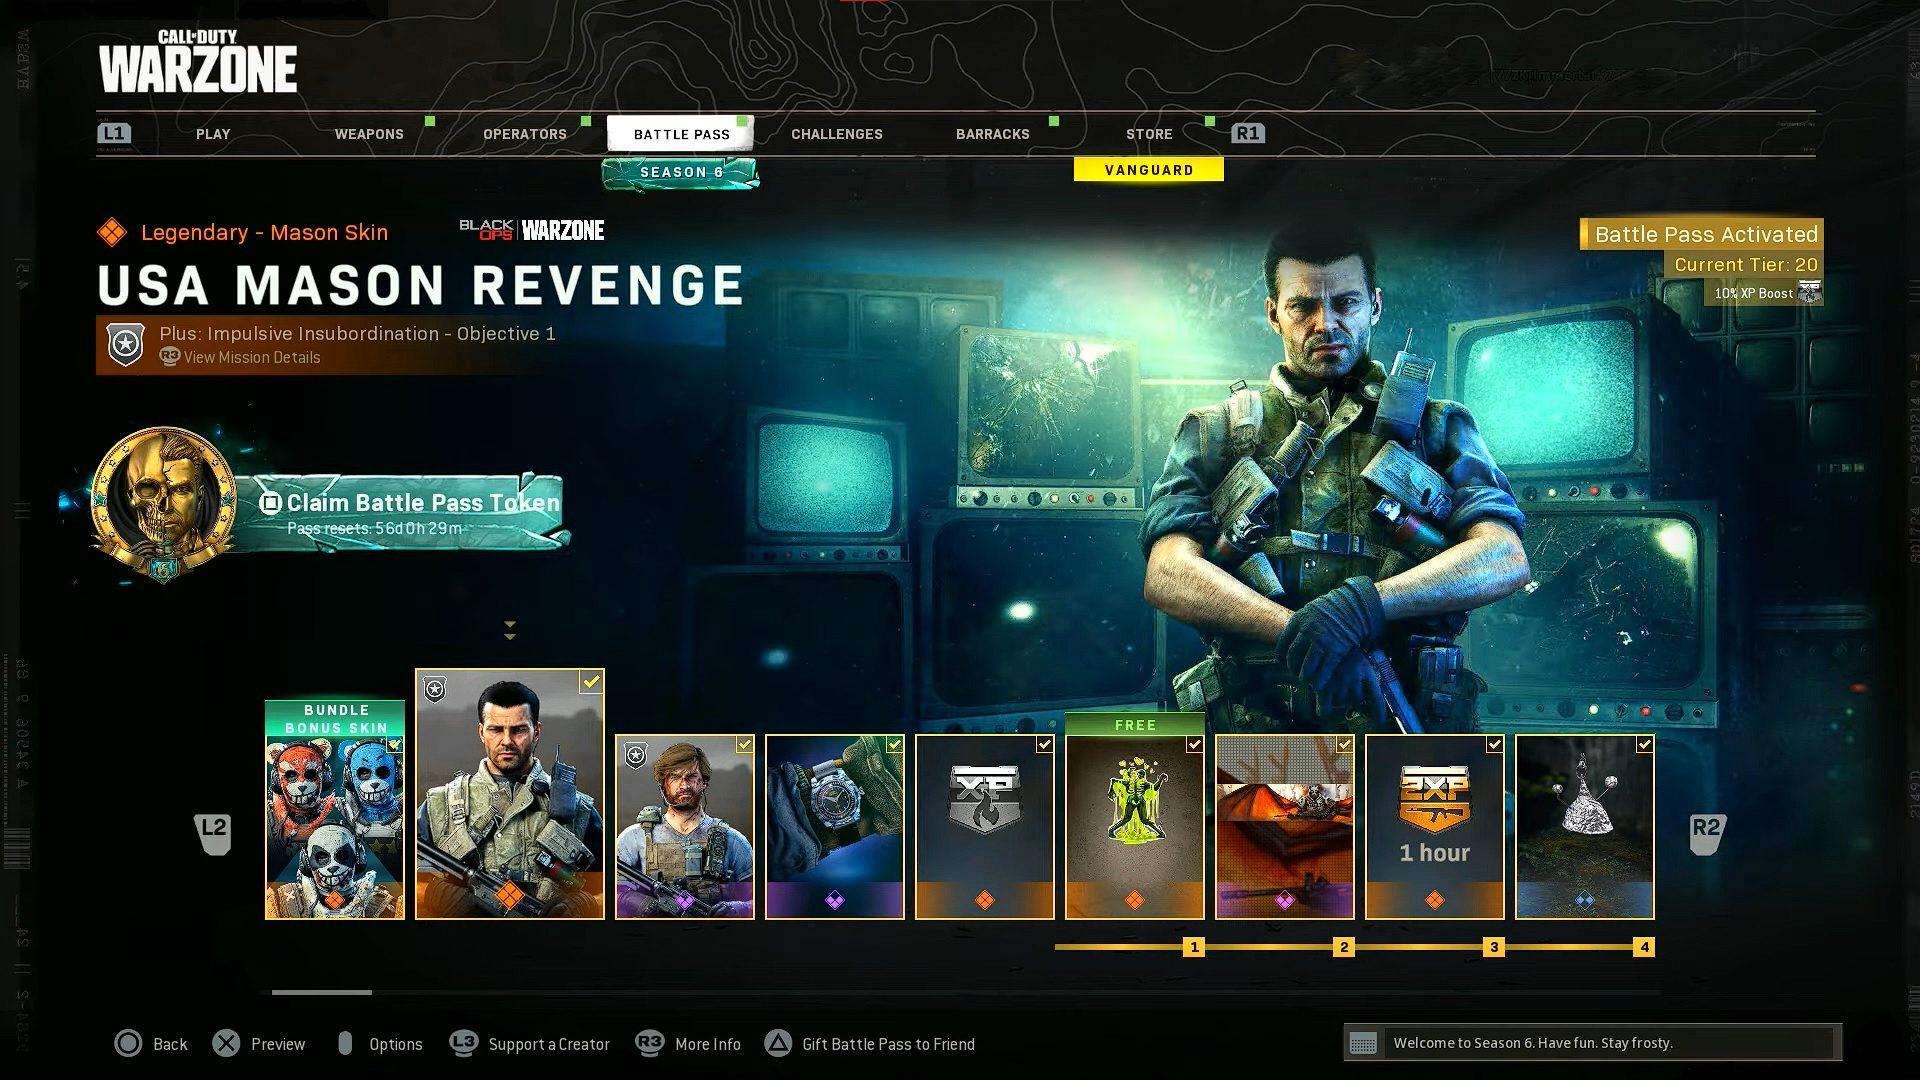 Black Ops Cold War Season 6 Battle Pass: Tier Rewards For Final Season